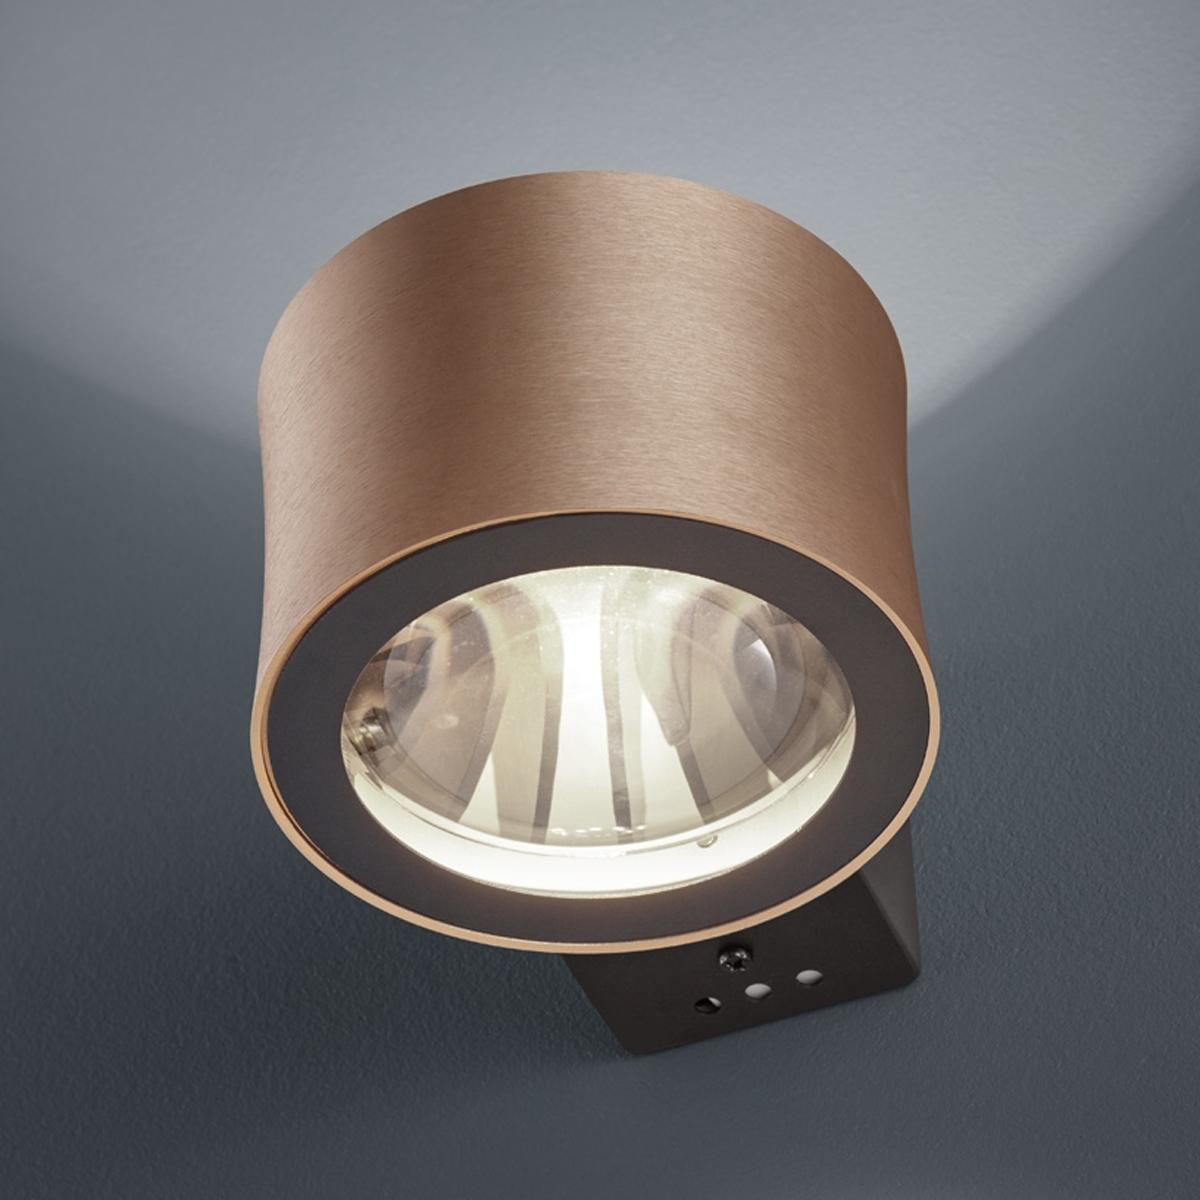 BANKAMP LeuchtenmanufakturLED-Wandleuchte Impulse4325/1-74